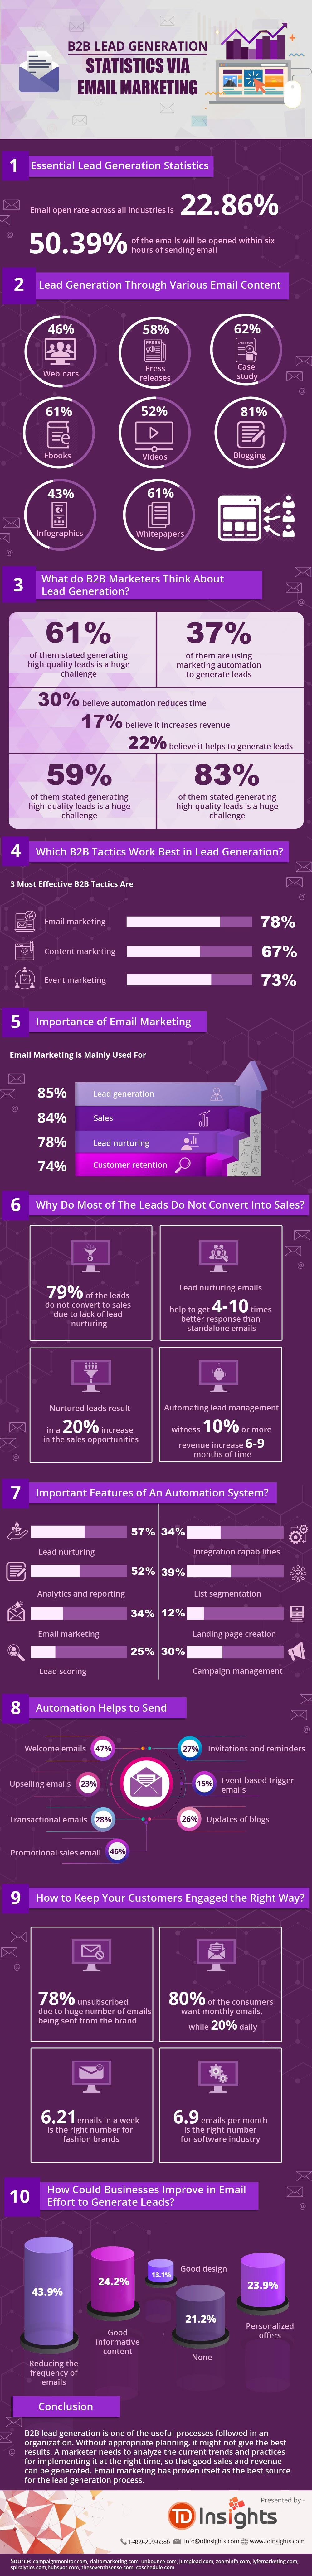 B2B Lead Generation Statistics via Email Marketing #infographic